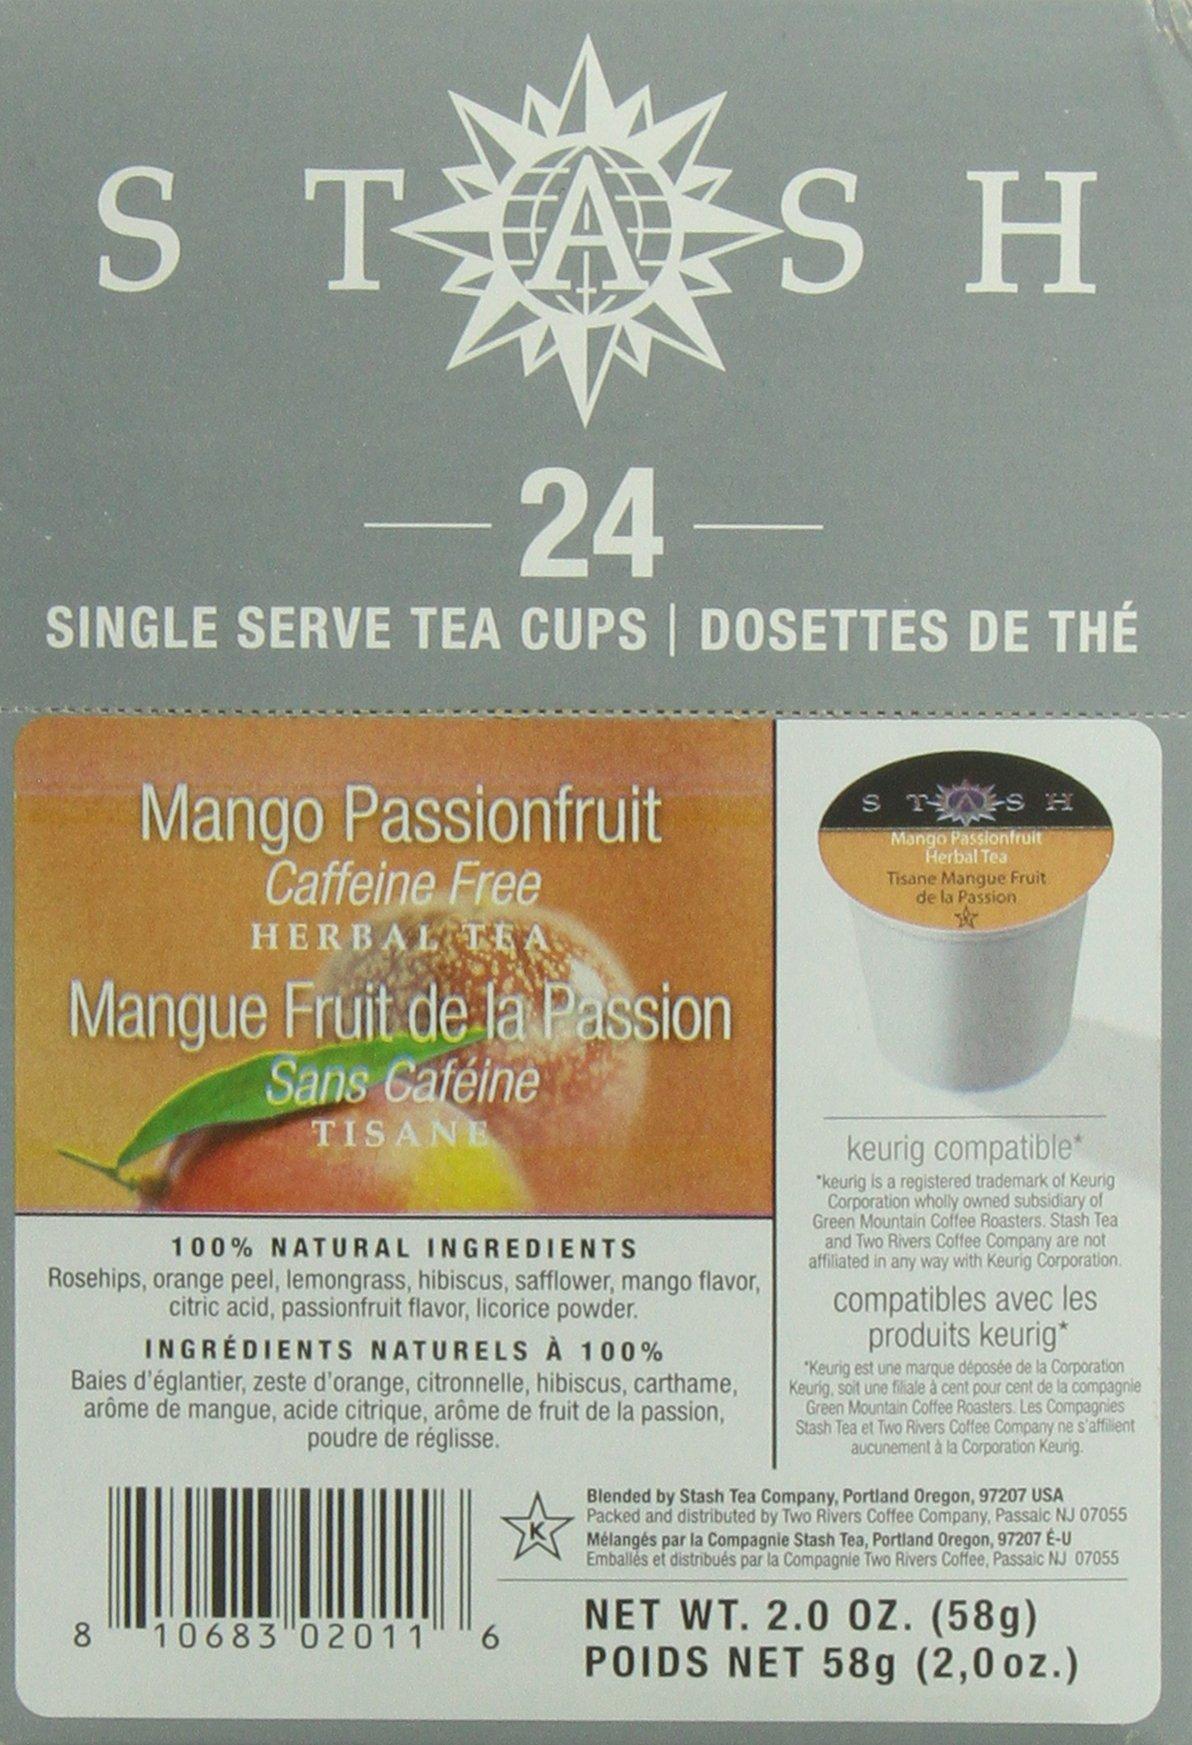 Stash Tea Mango Passionfruit Single-Cup Tea for Keurig K-Cup Brewers, 24 Count